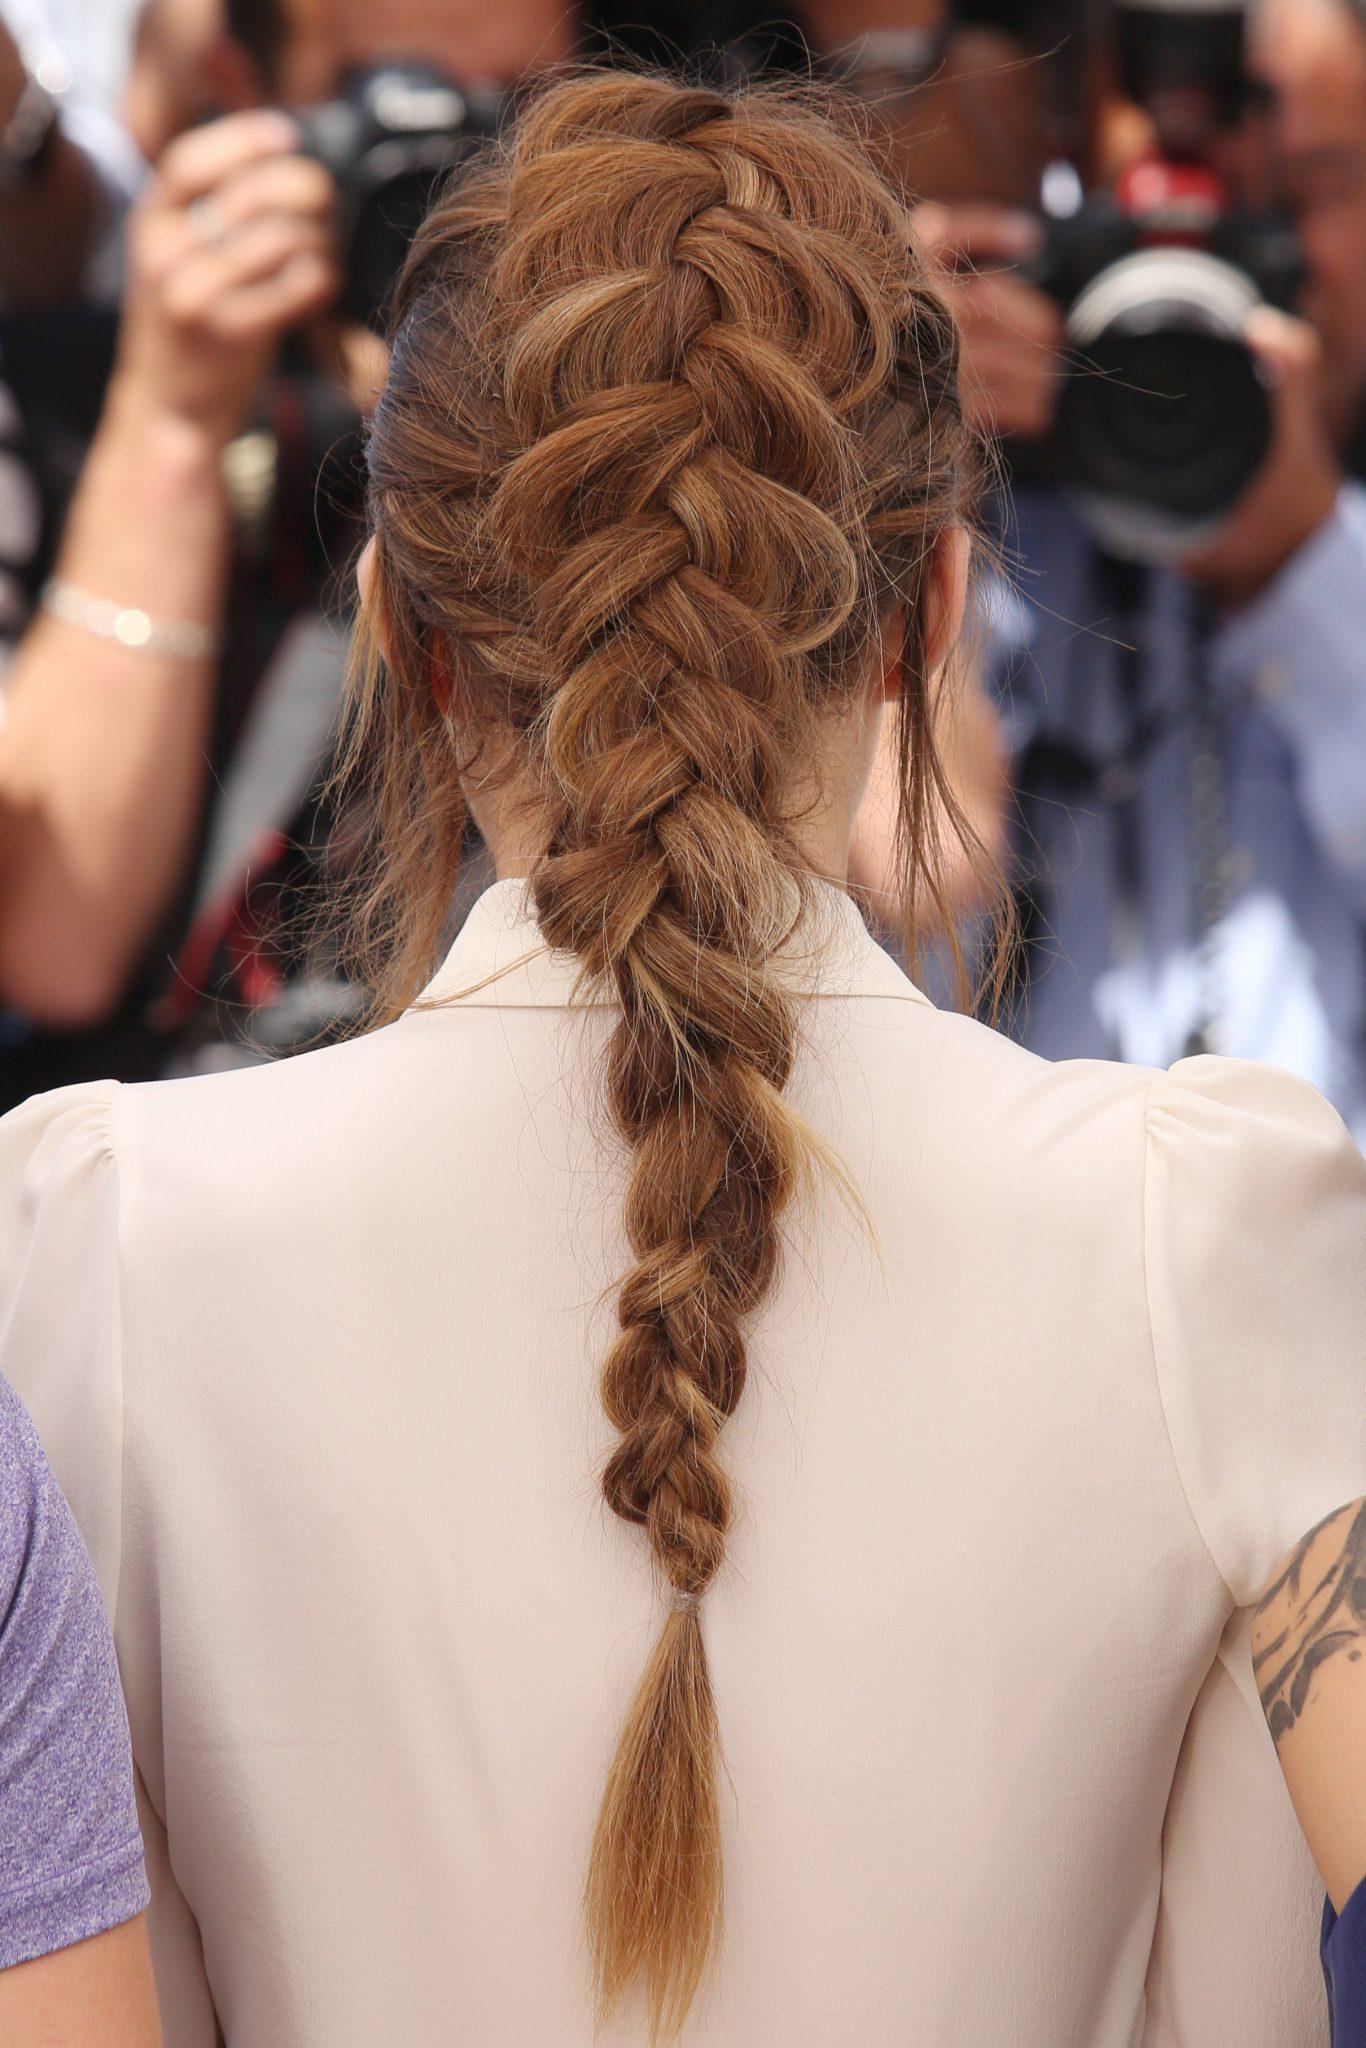 kiểu tết tóc đuôi tôm